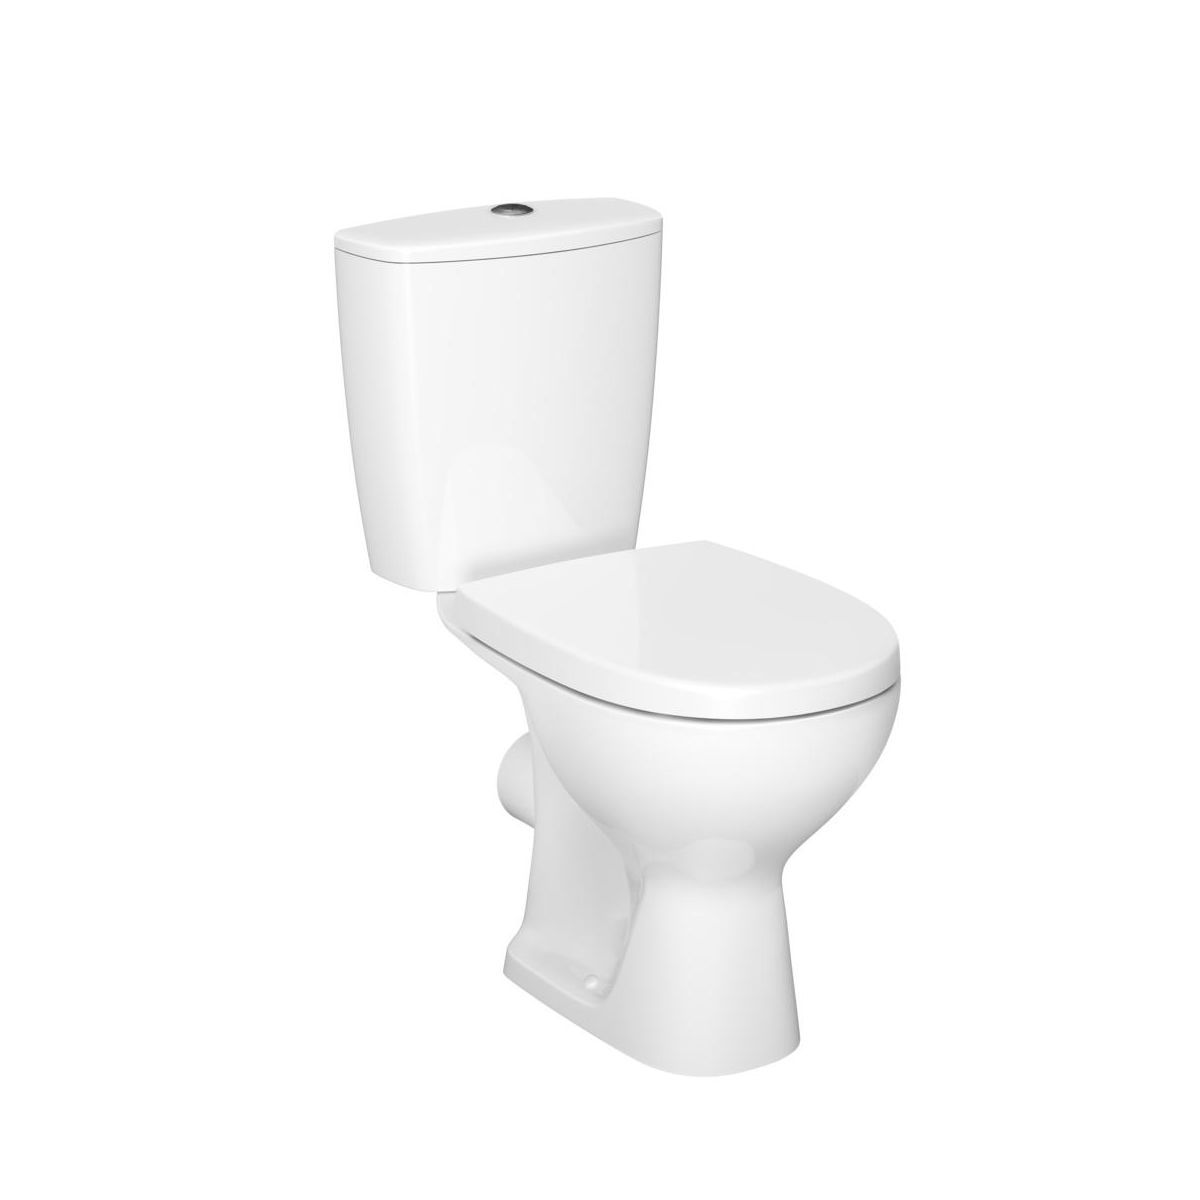 WC kompakt ARTECO CERSANIT